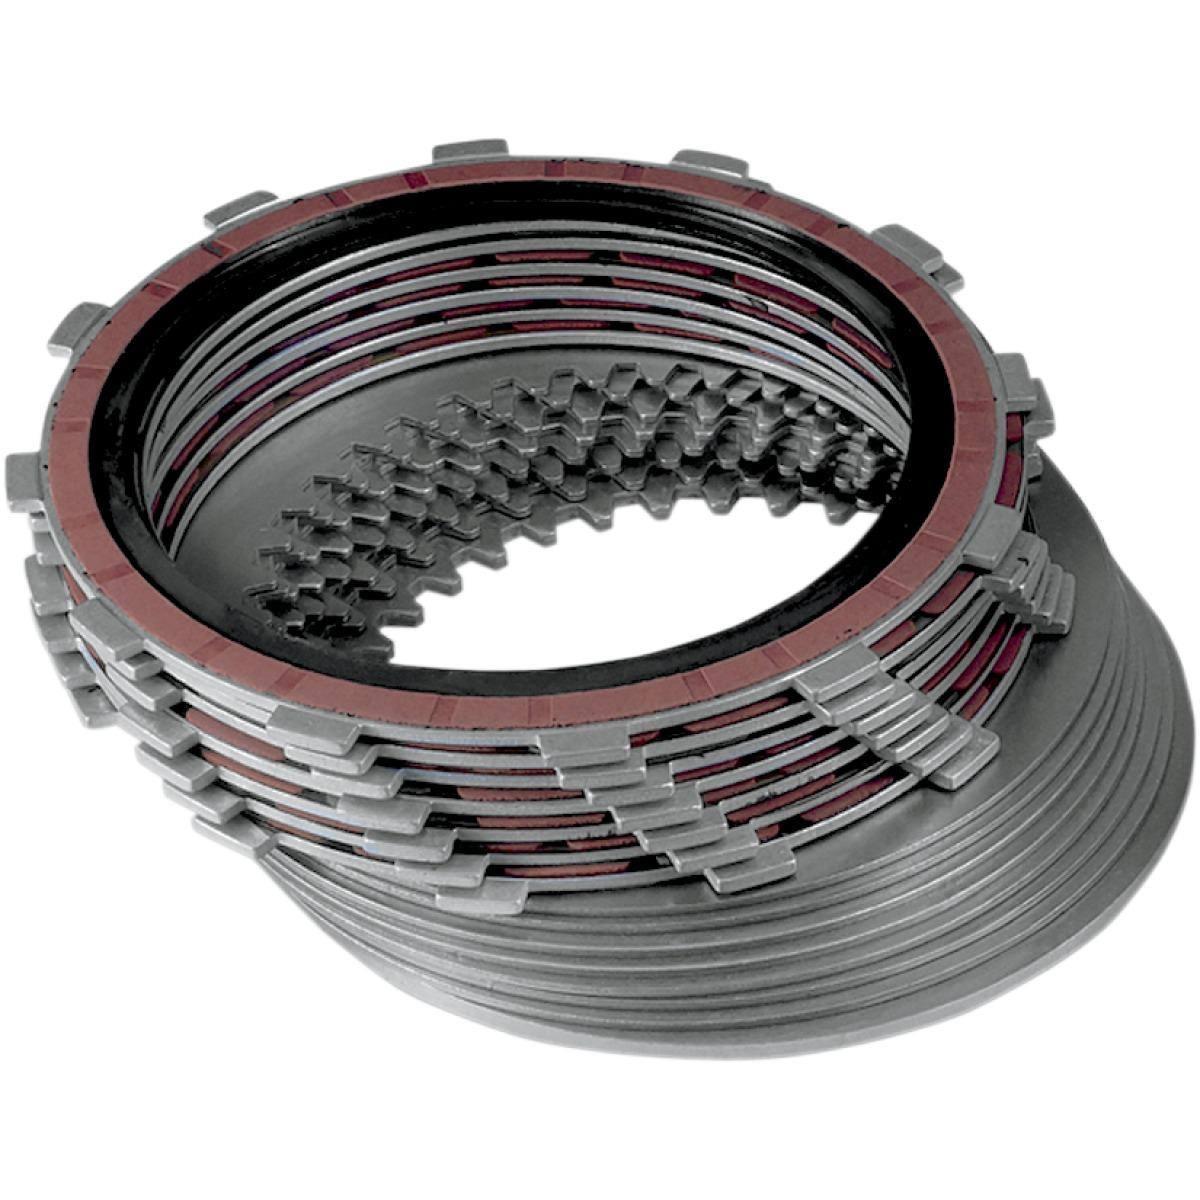 WR500 YZ490 Steel /& Springs Yamaha IT250 Ebc Clutch Friction Plate IT490